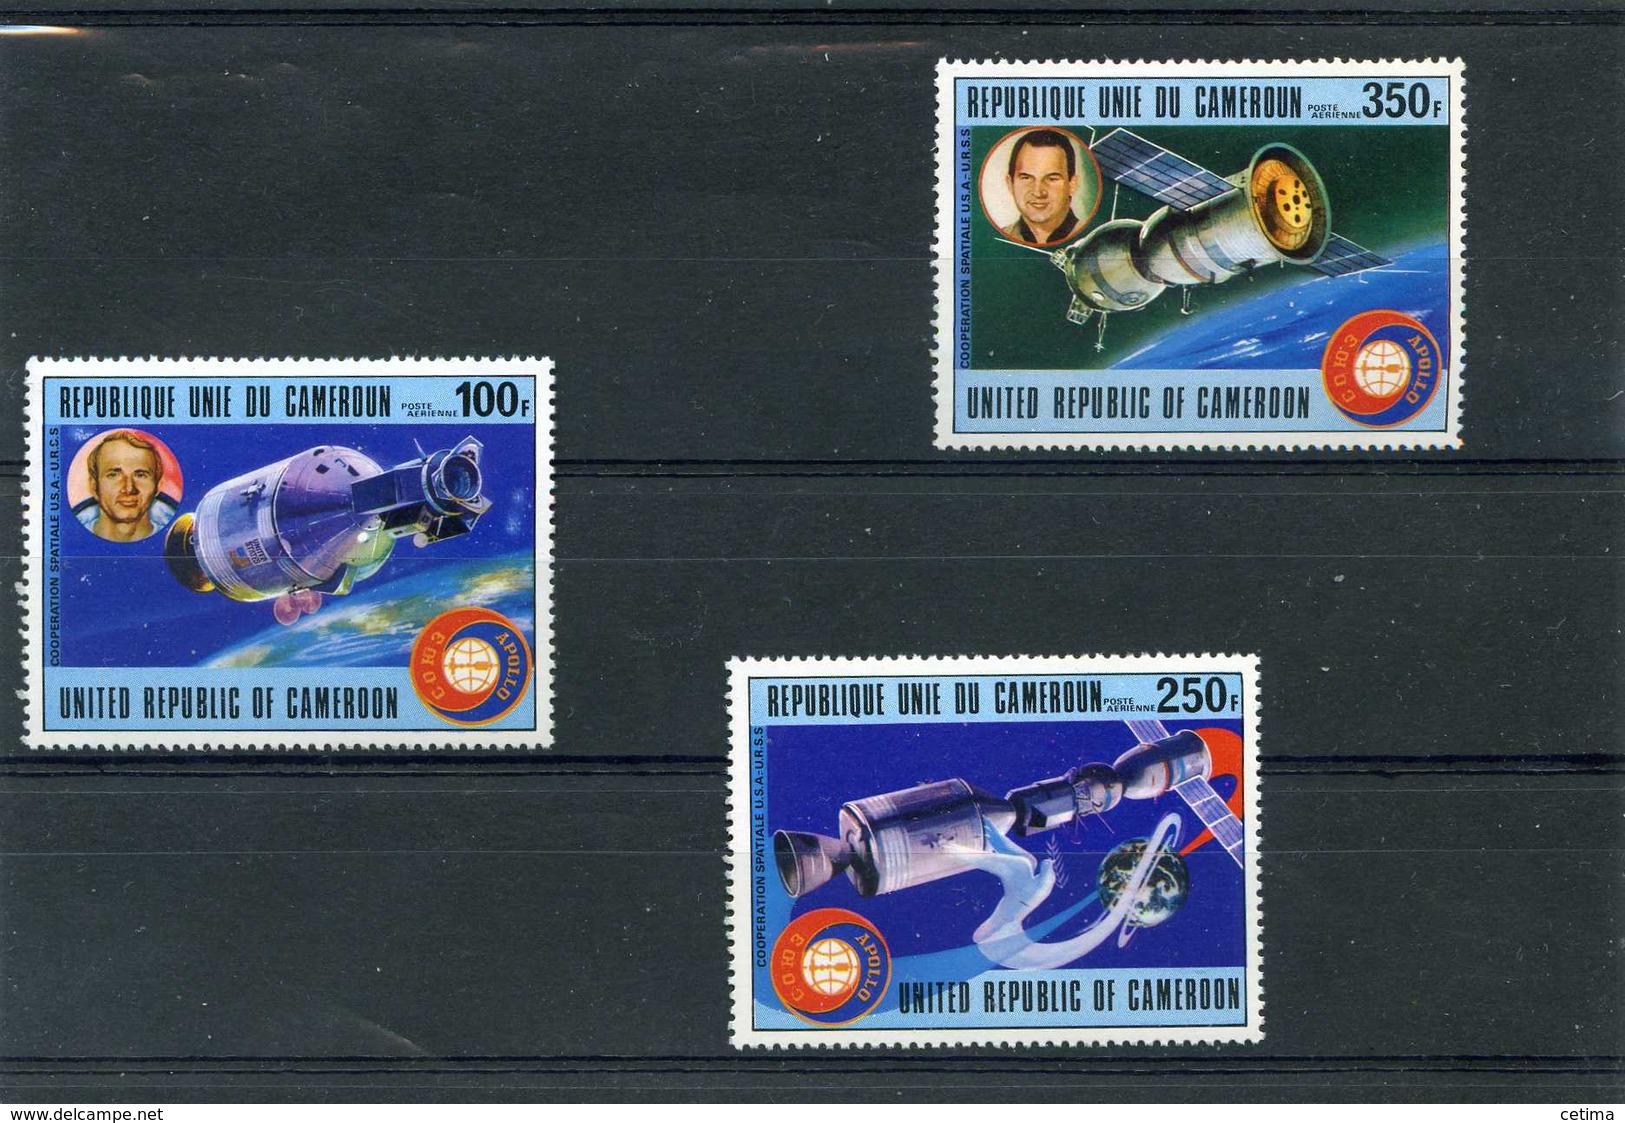 Cameroun - Coopération Spatiale U S A - U R S  S .sujets Divers - Neufs - Camerun (1960-...)